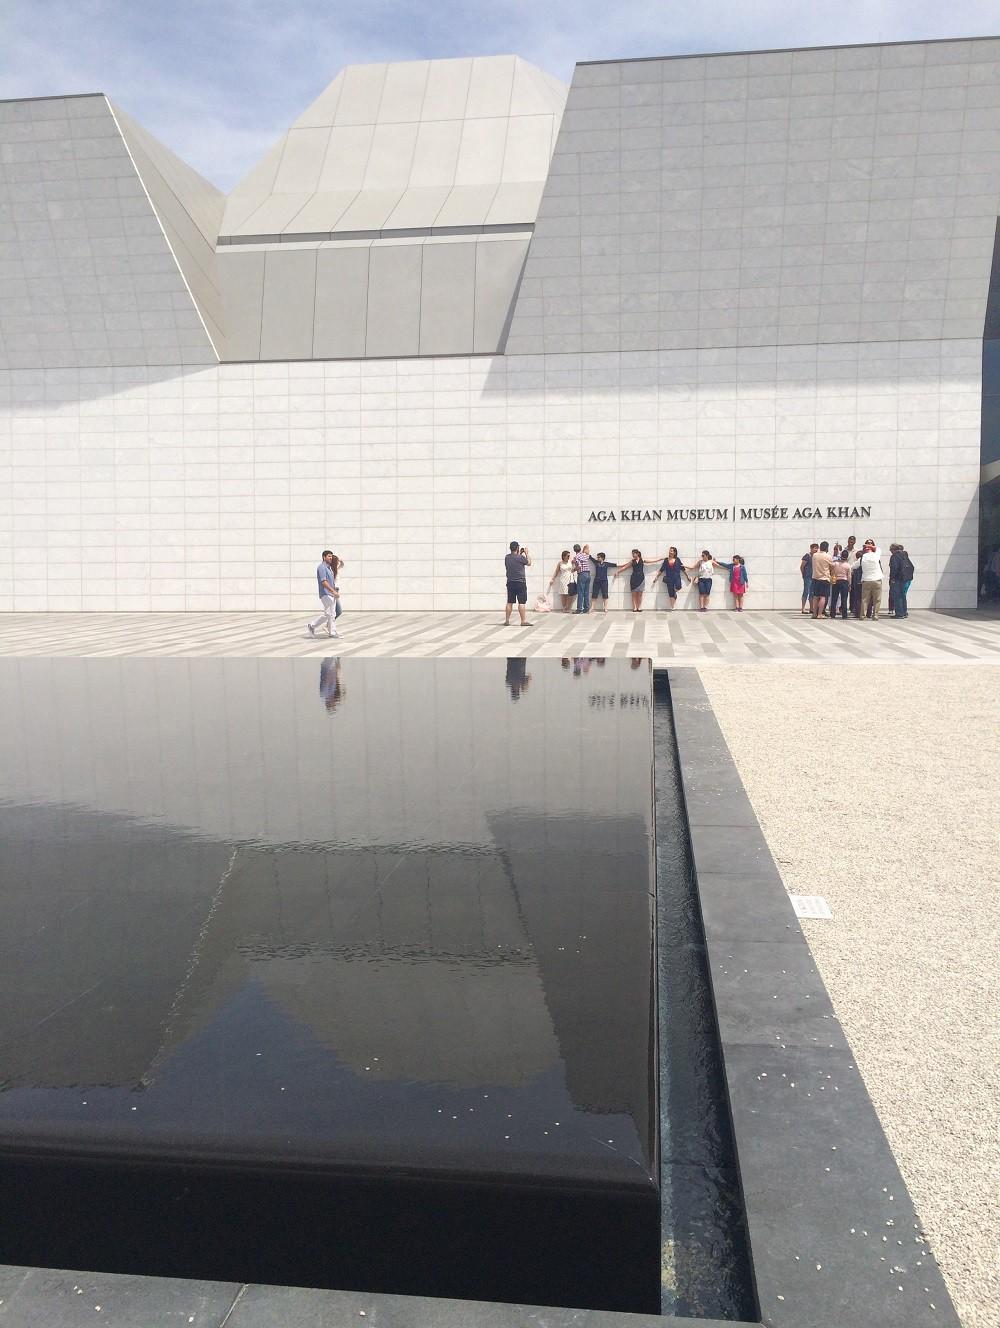 May 24th 2015 – Toronto's 16th Annual Doors Open. The Aga Khan Museum. Photo: Malik Merchant / Simerg. Copyright